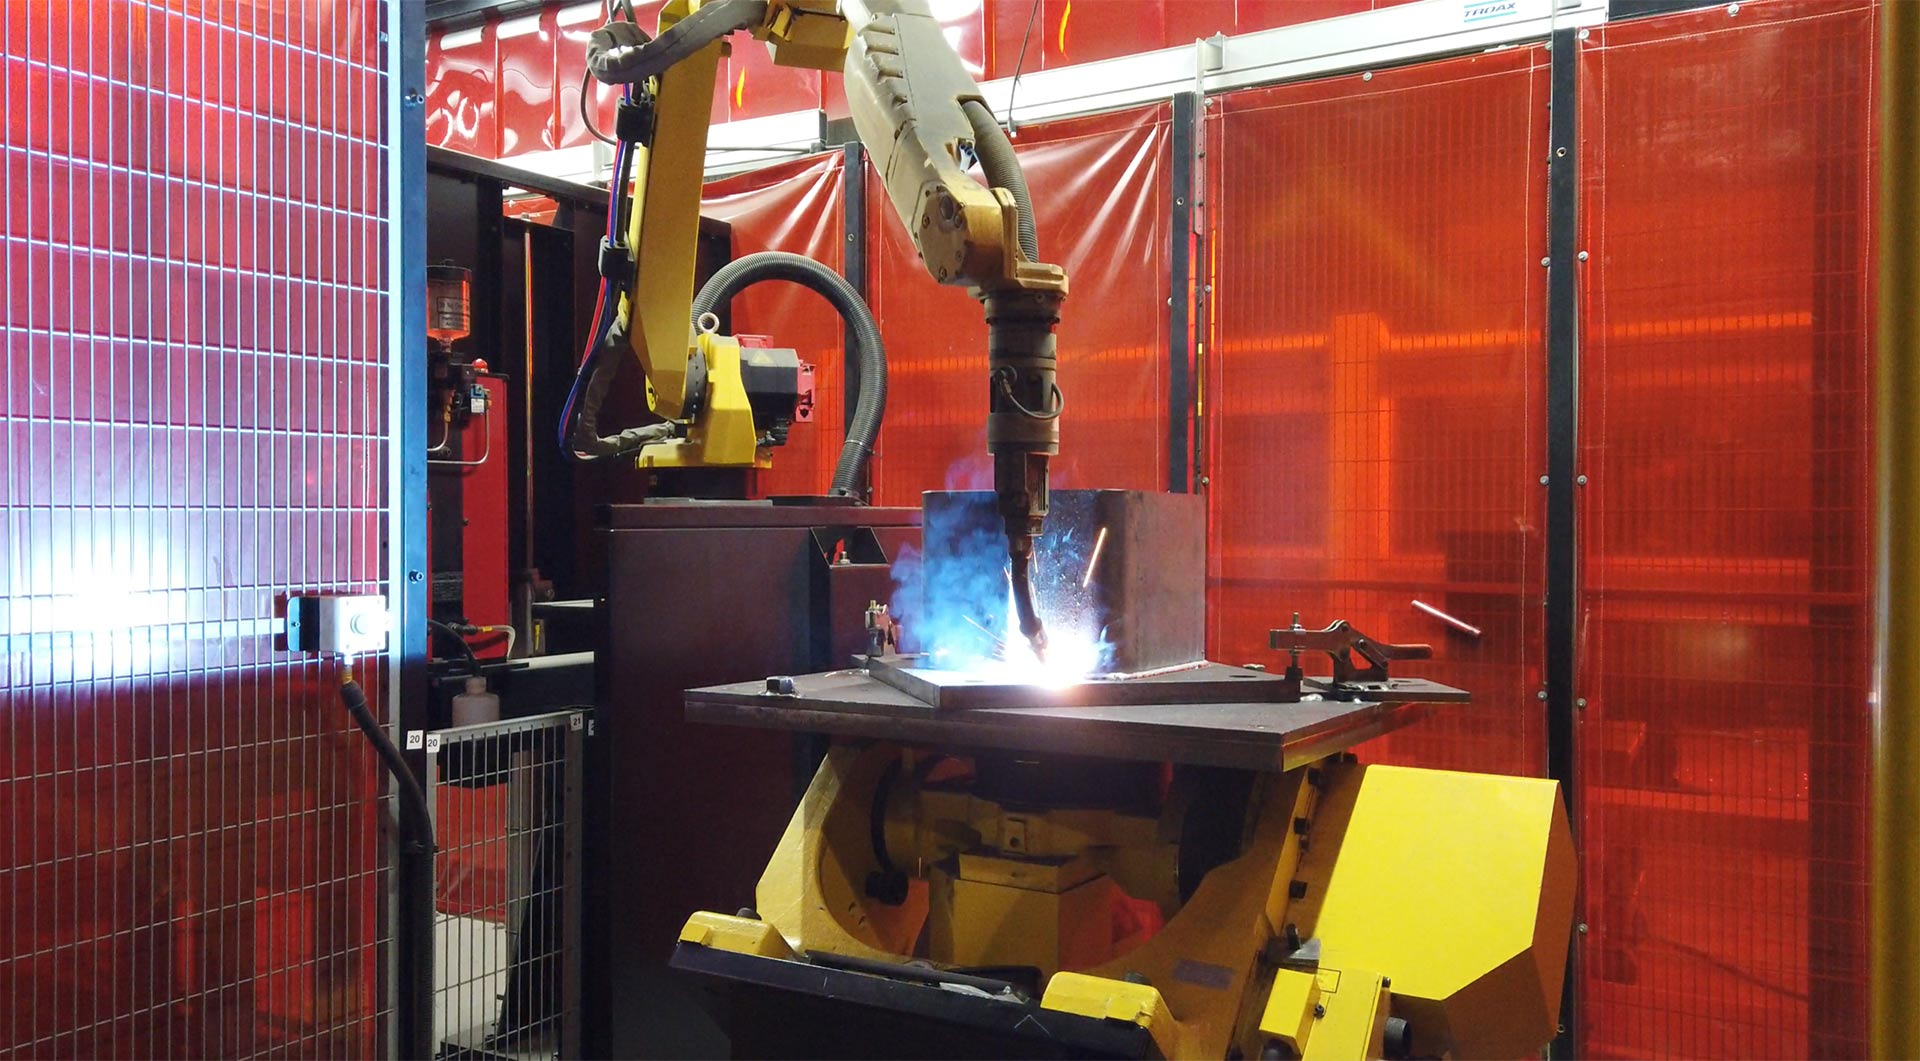 Tincher's robot welder